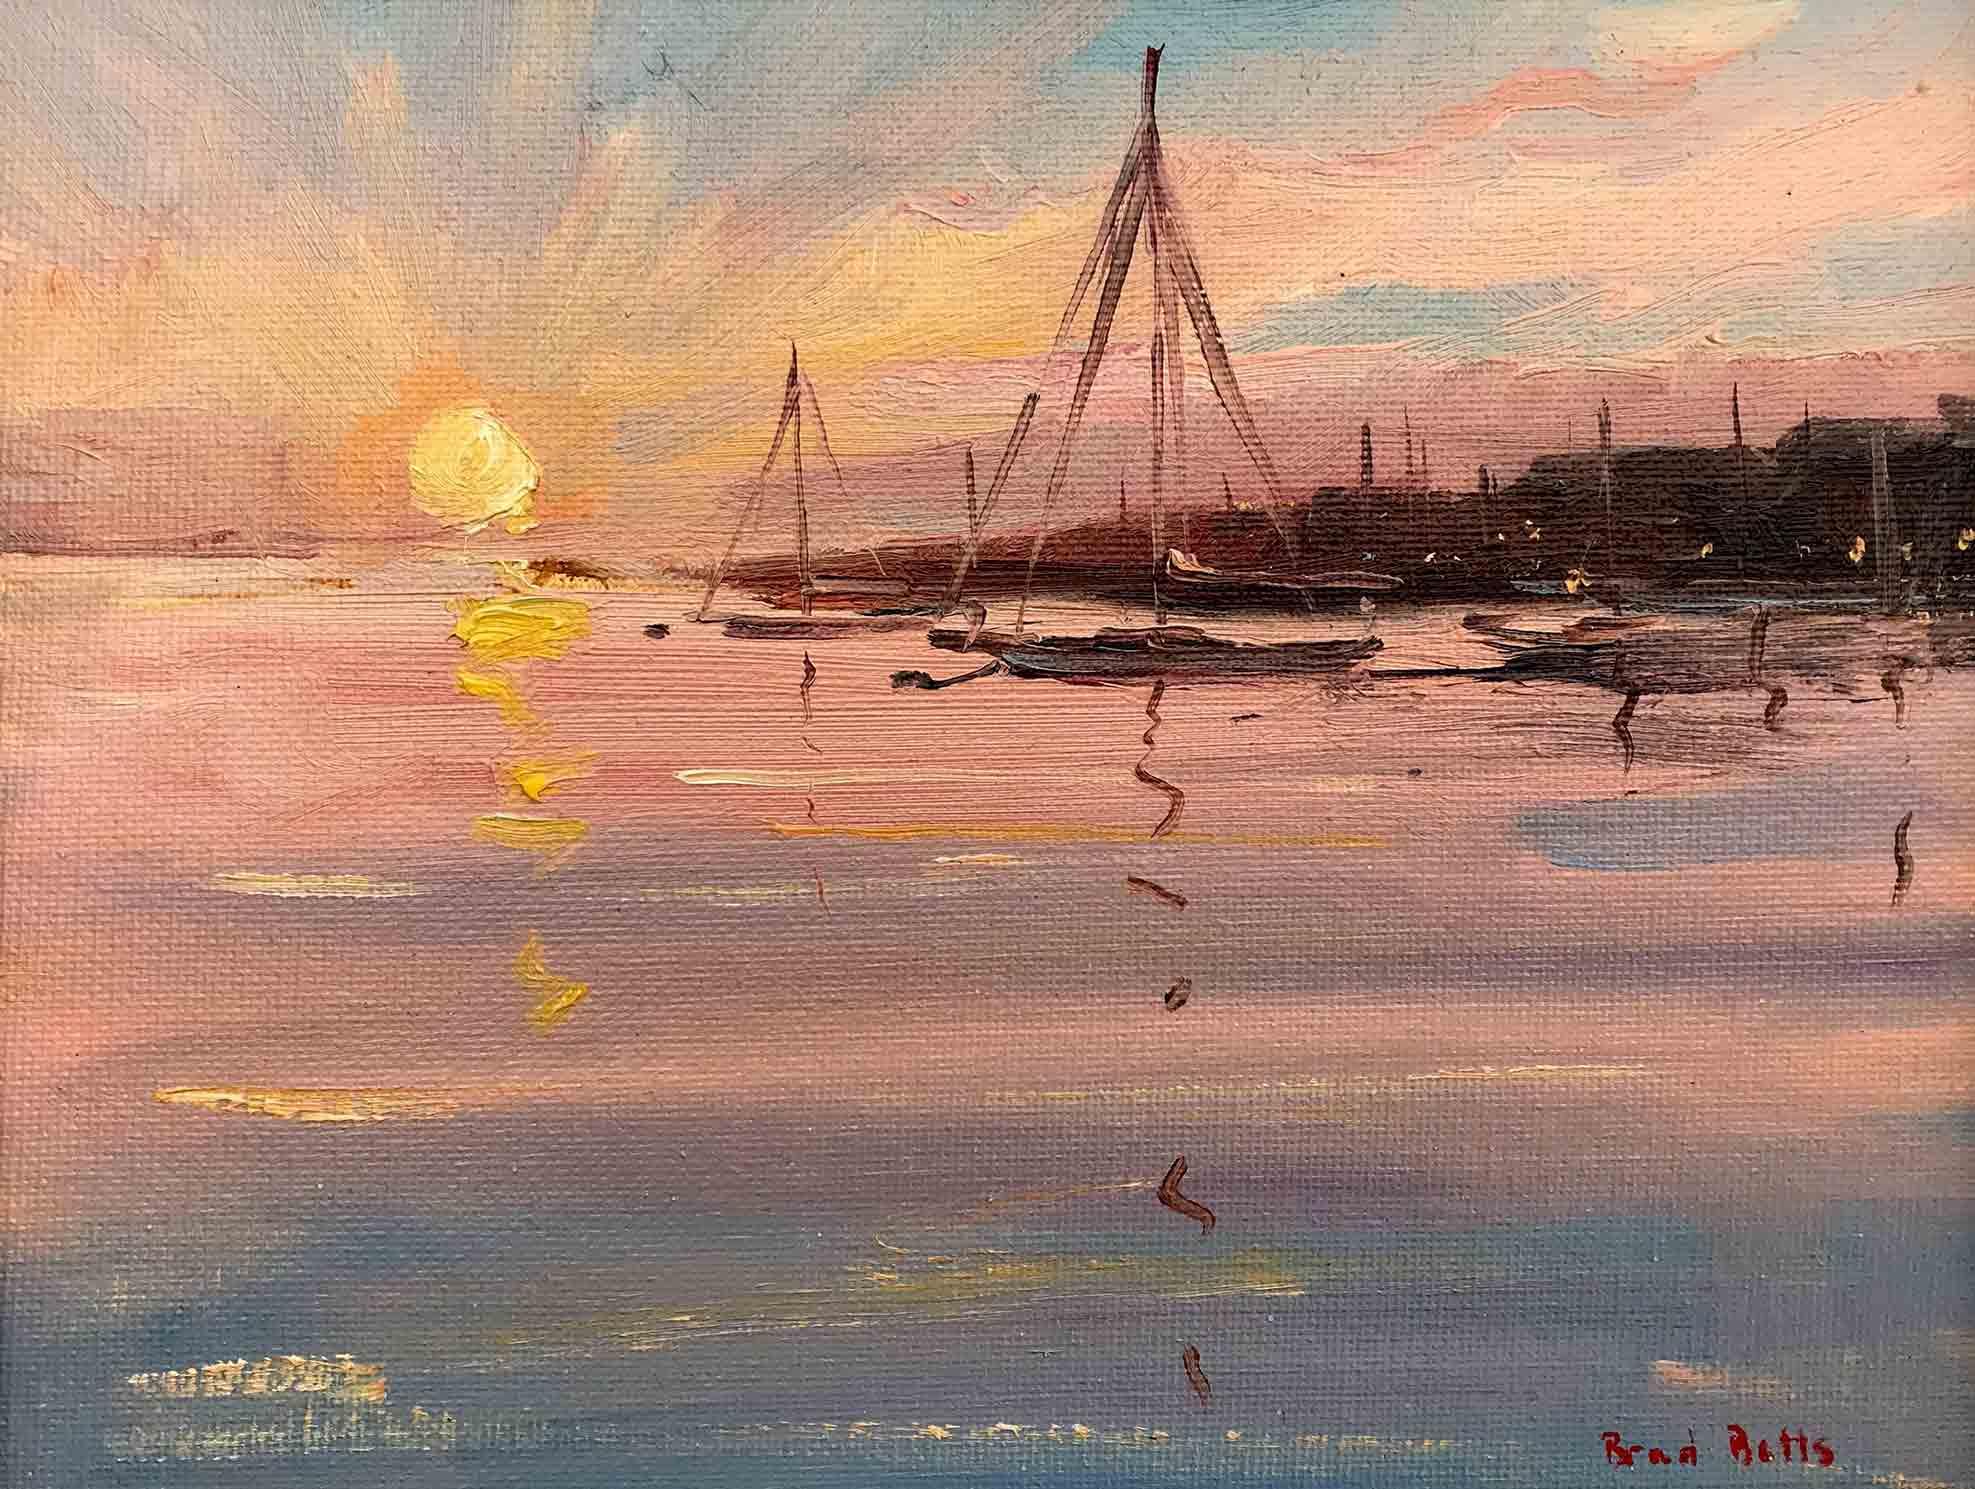 Harbor-Sunset-8x10_web.jpg